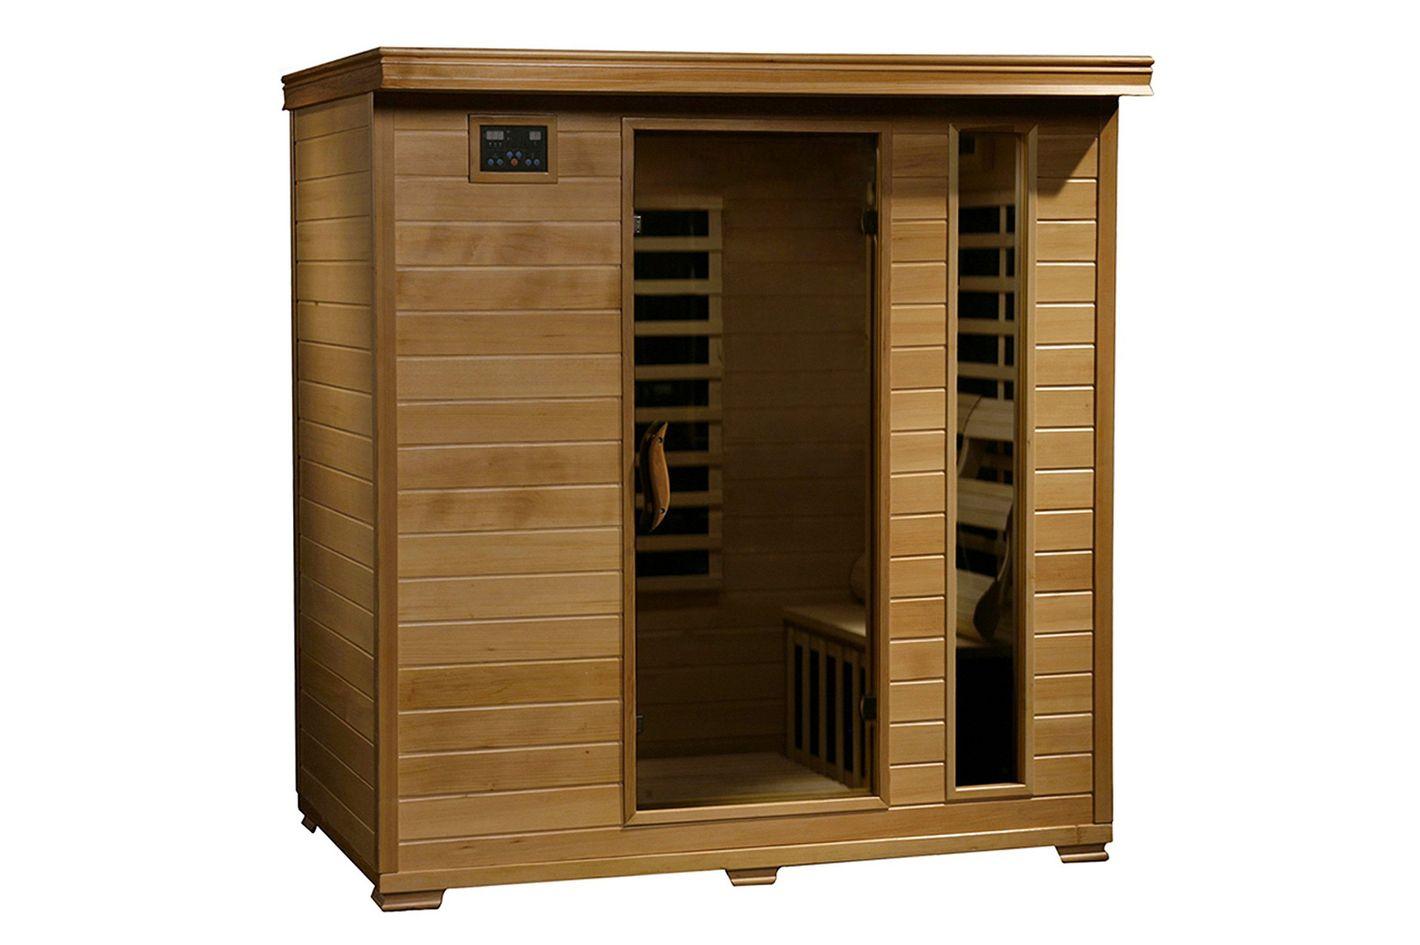 Radiant Saunas 4-Person Hemlock Infrared Sauna